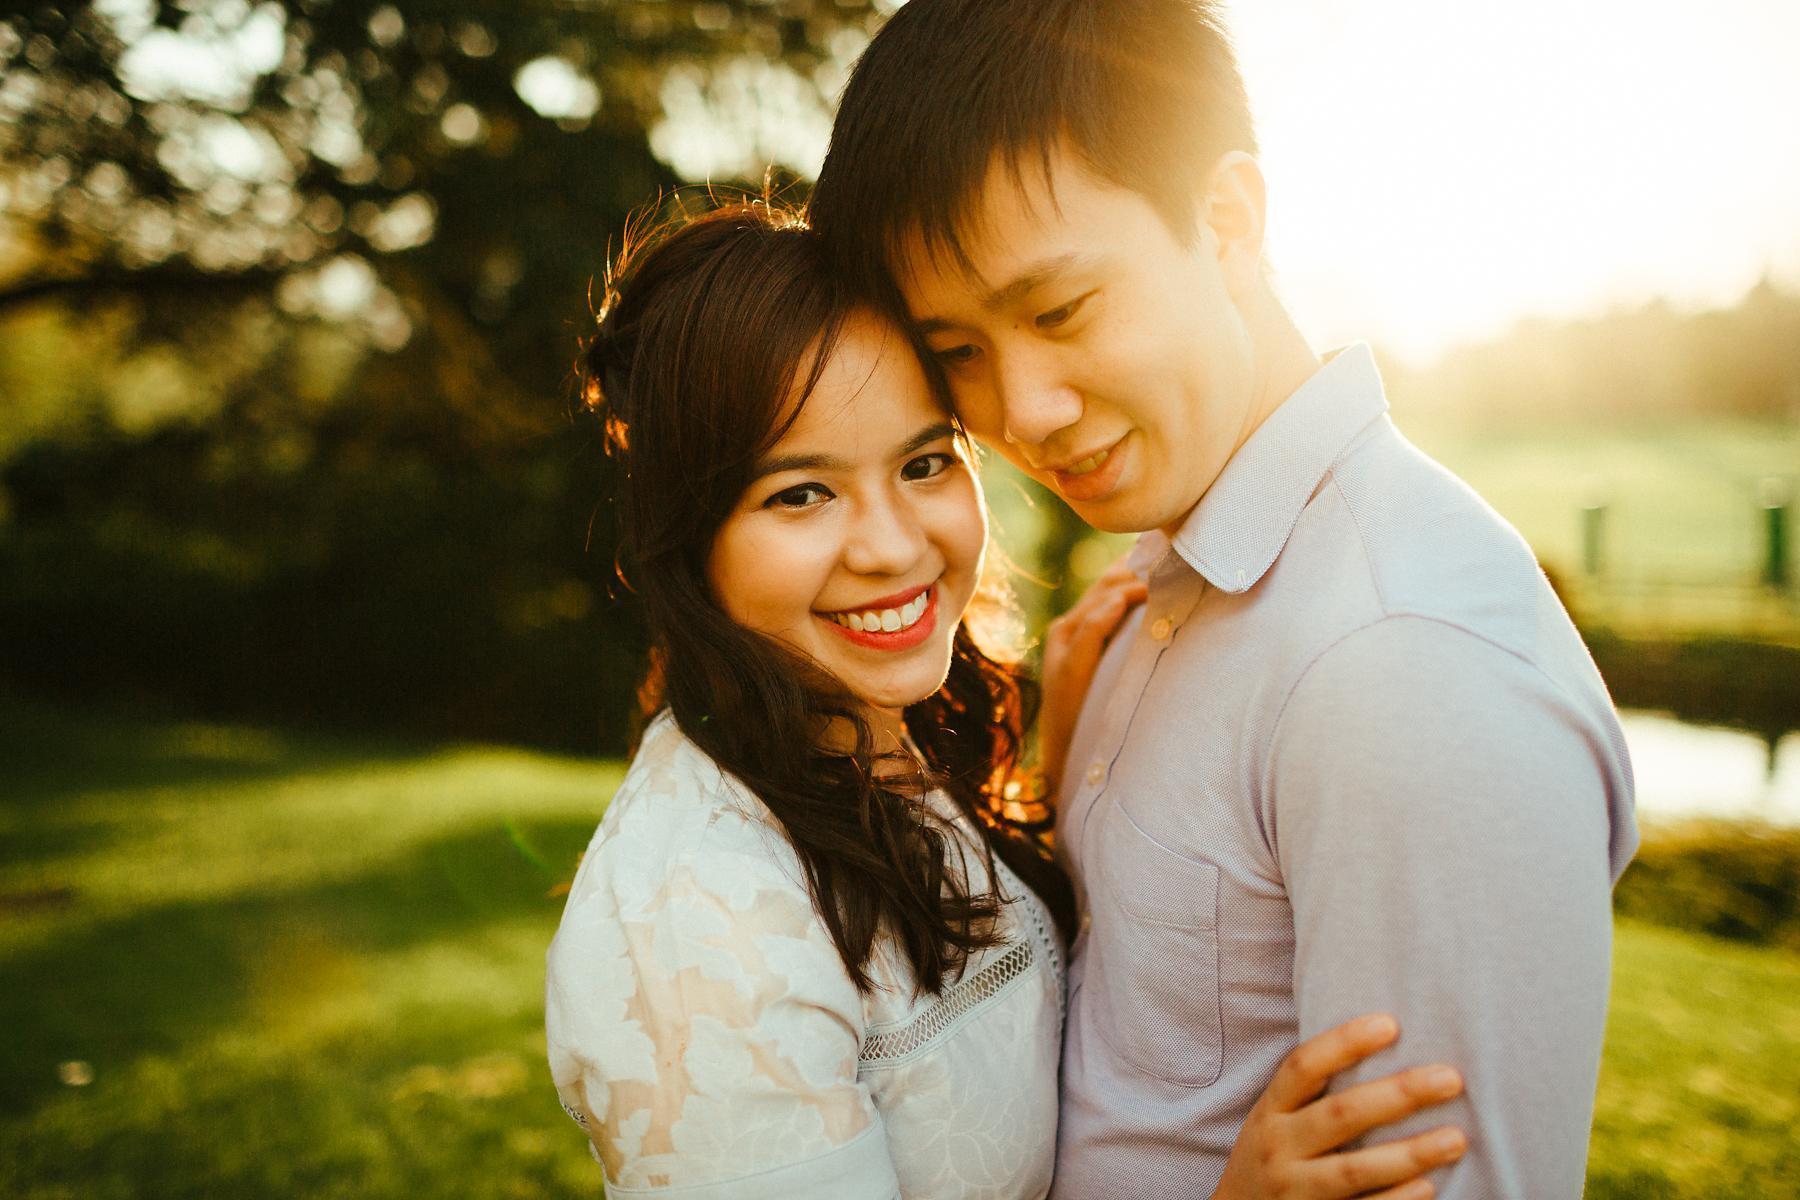 Geena&Yuan-Oxford-Prewedding-147